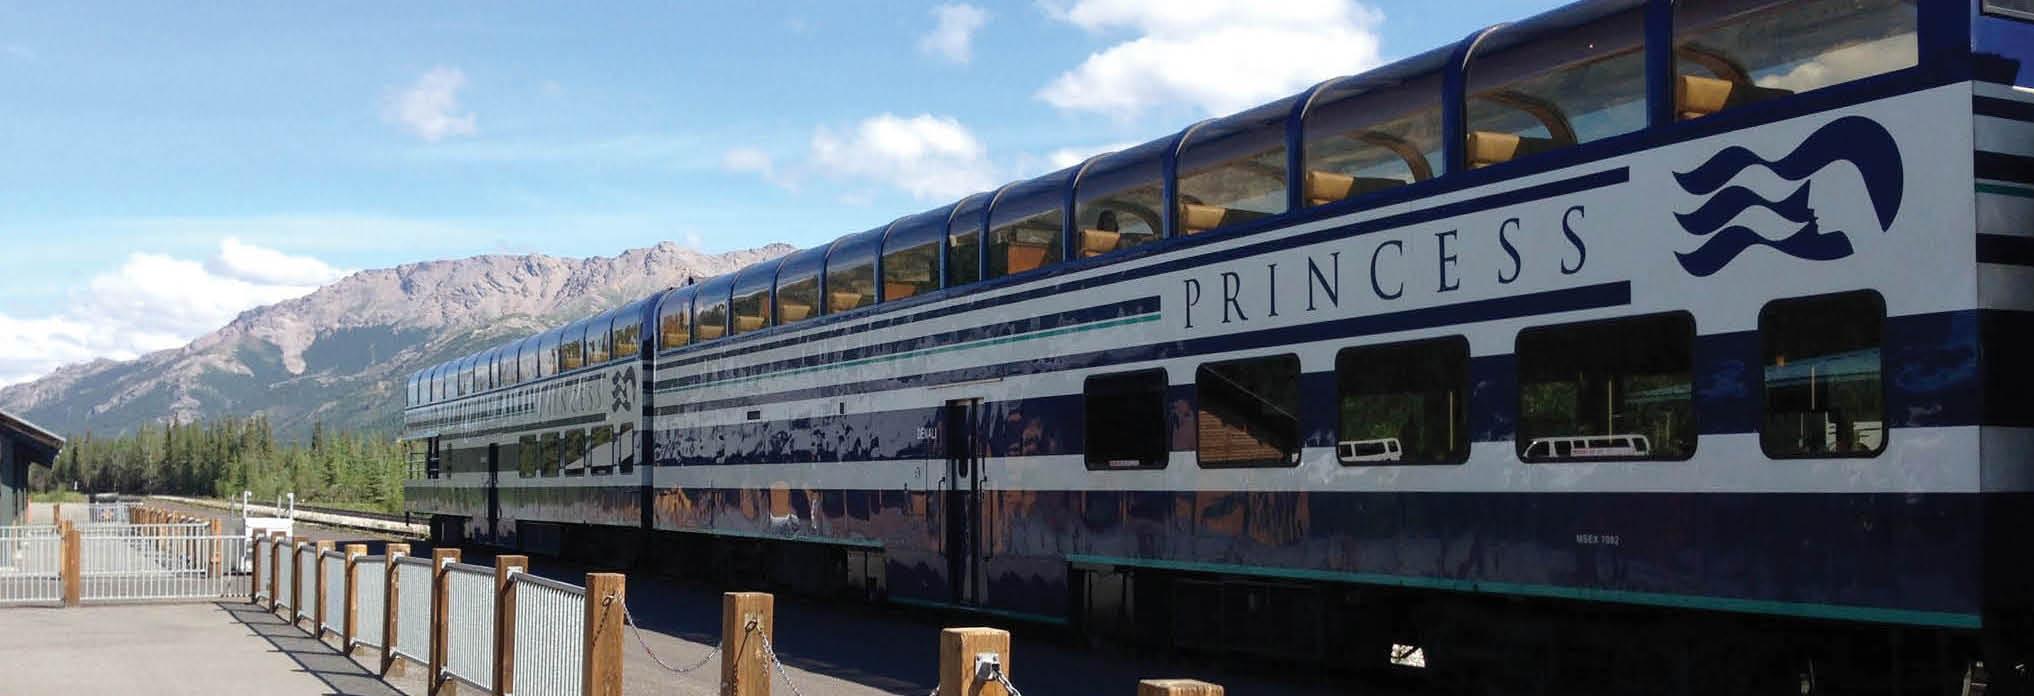 Princess Lodges - Rail Tours - main banner image - Alaska